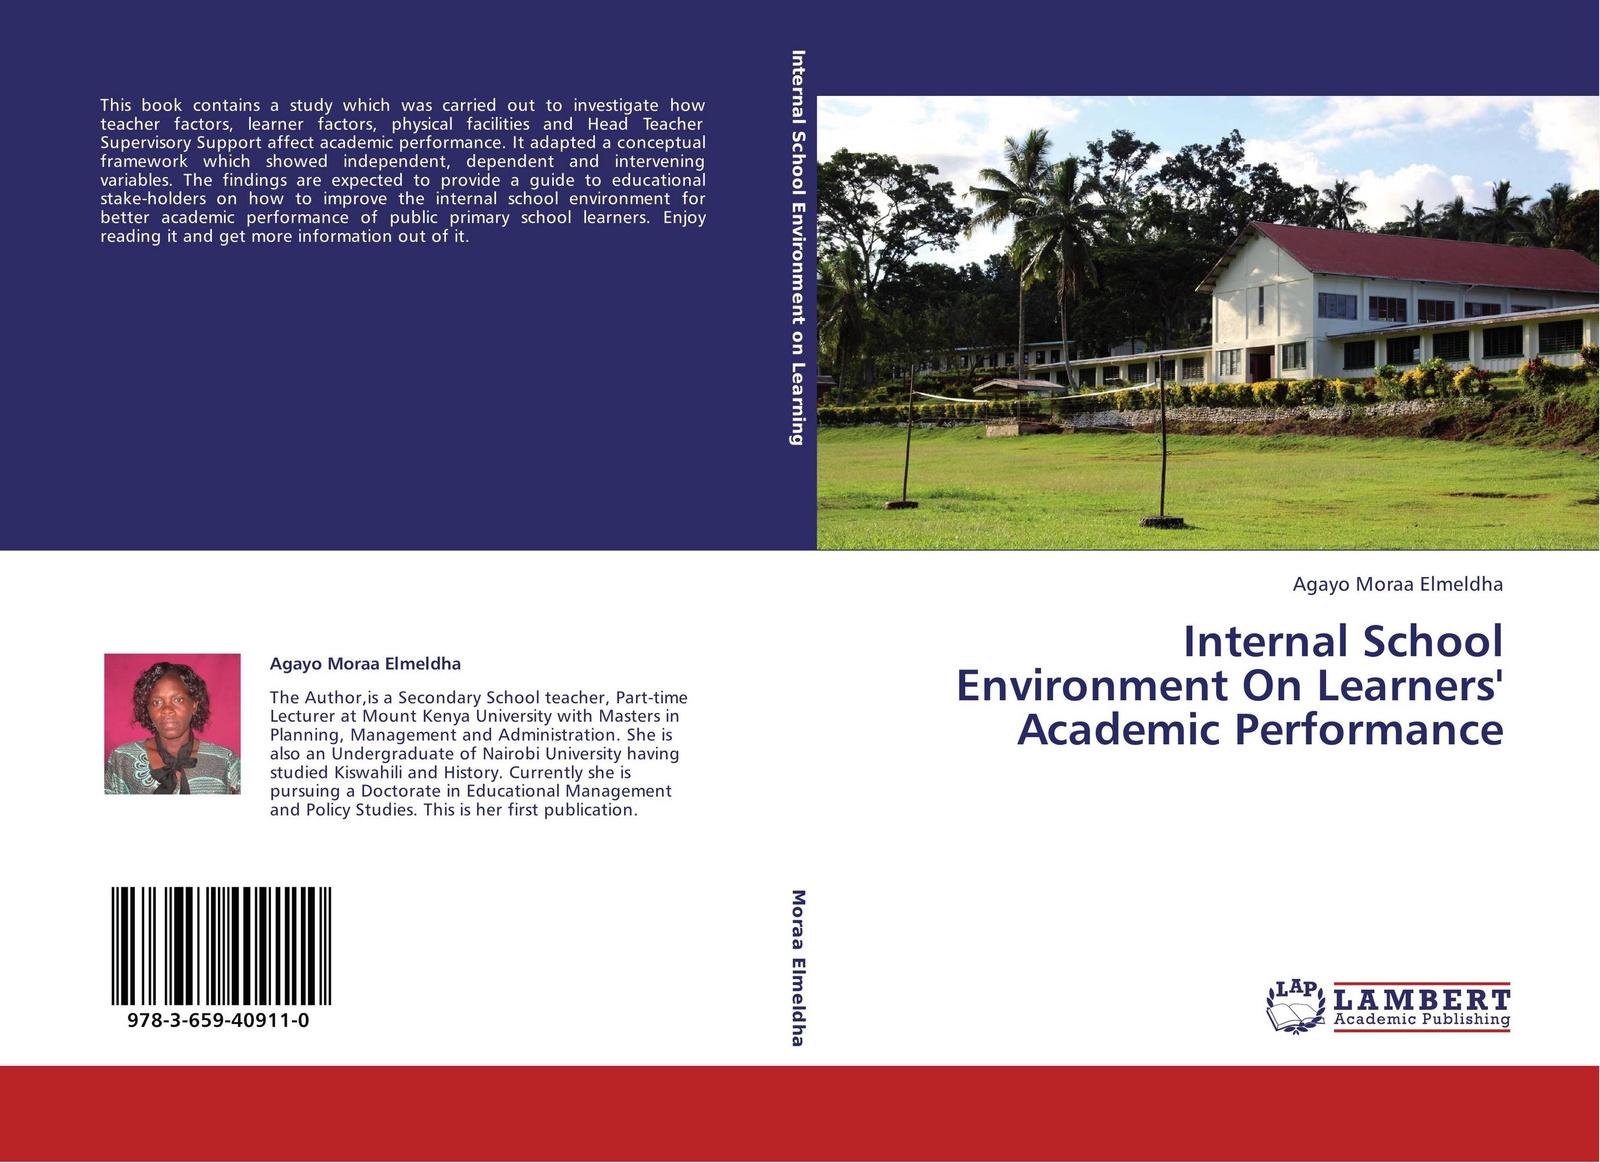 Agayo Moraa Elmeldha Internal School Environment On Learners' Academic Performance study attitude and academic performance